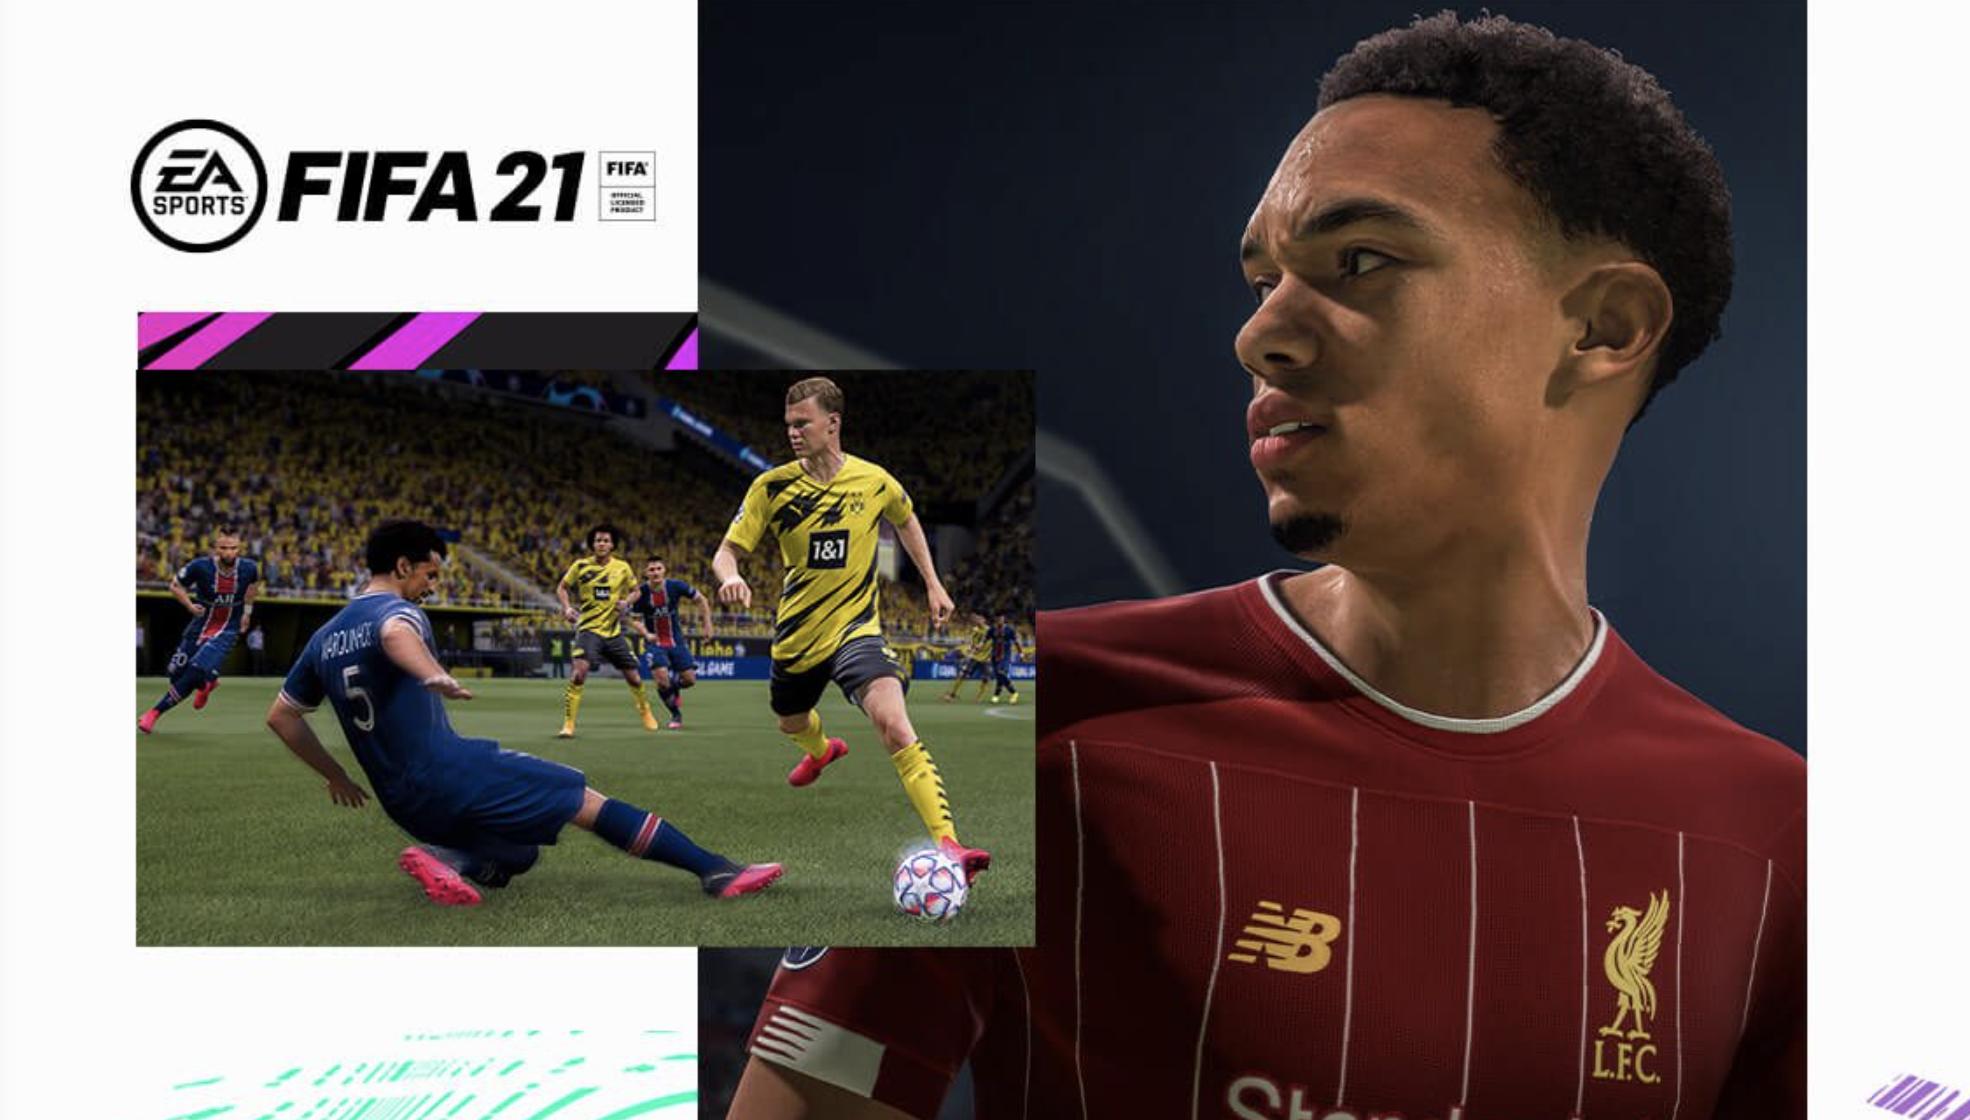 【FIFA21】PS4版とPS5版の発売日はいつ?予約特典と最新情報